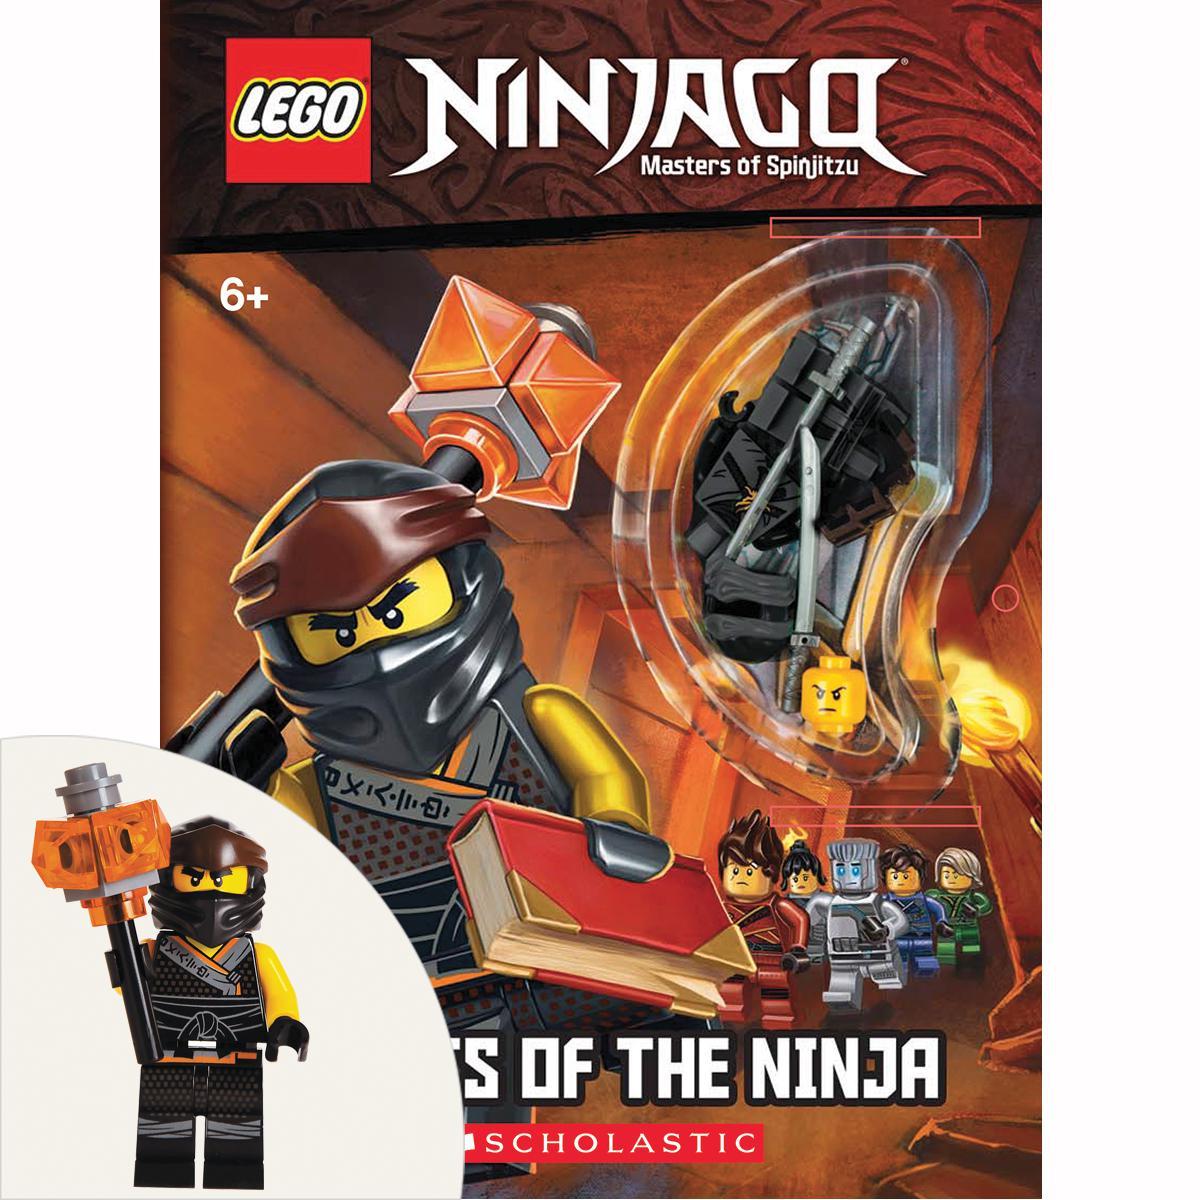 LEGO® NINJAGO®: Secrets of the Ninja